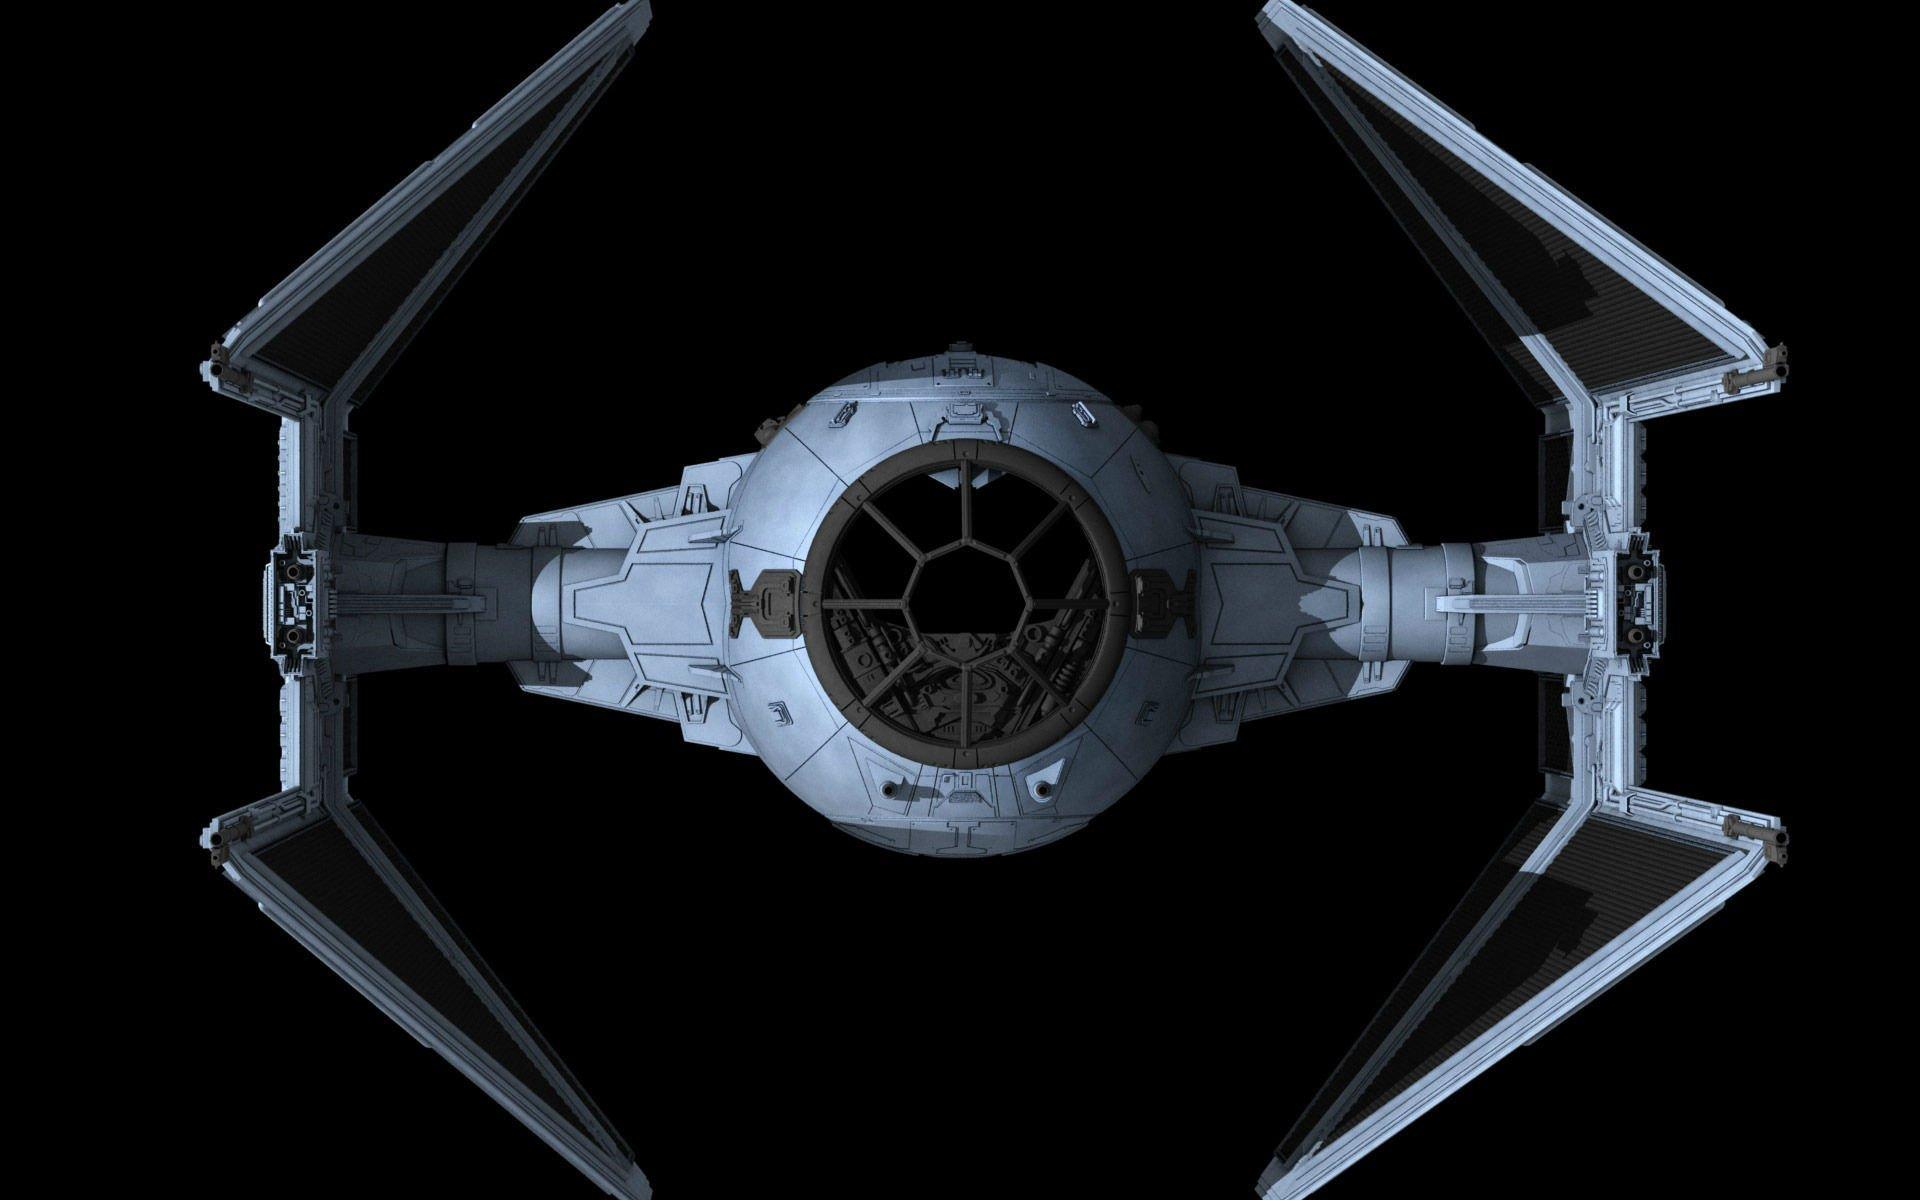 tie fighter star wars futuristic spaceship space sci fi wallpaper 1920x1200 811244 wallpaperup. Black Bedroom Furniture Sets. Home Design Ideas